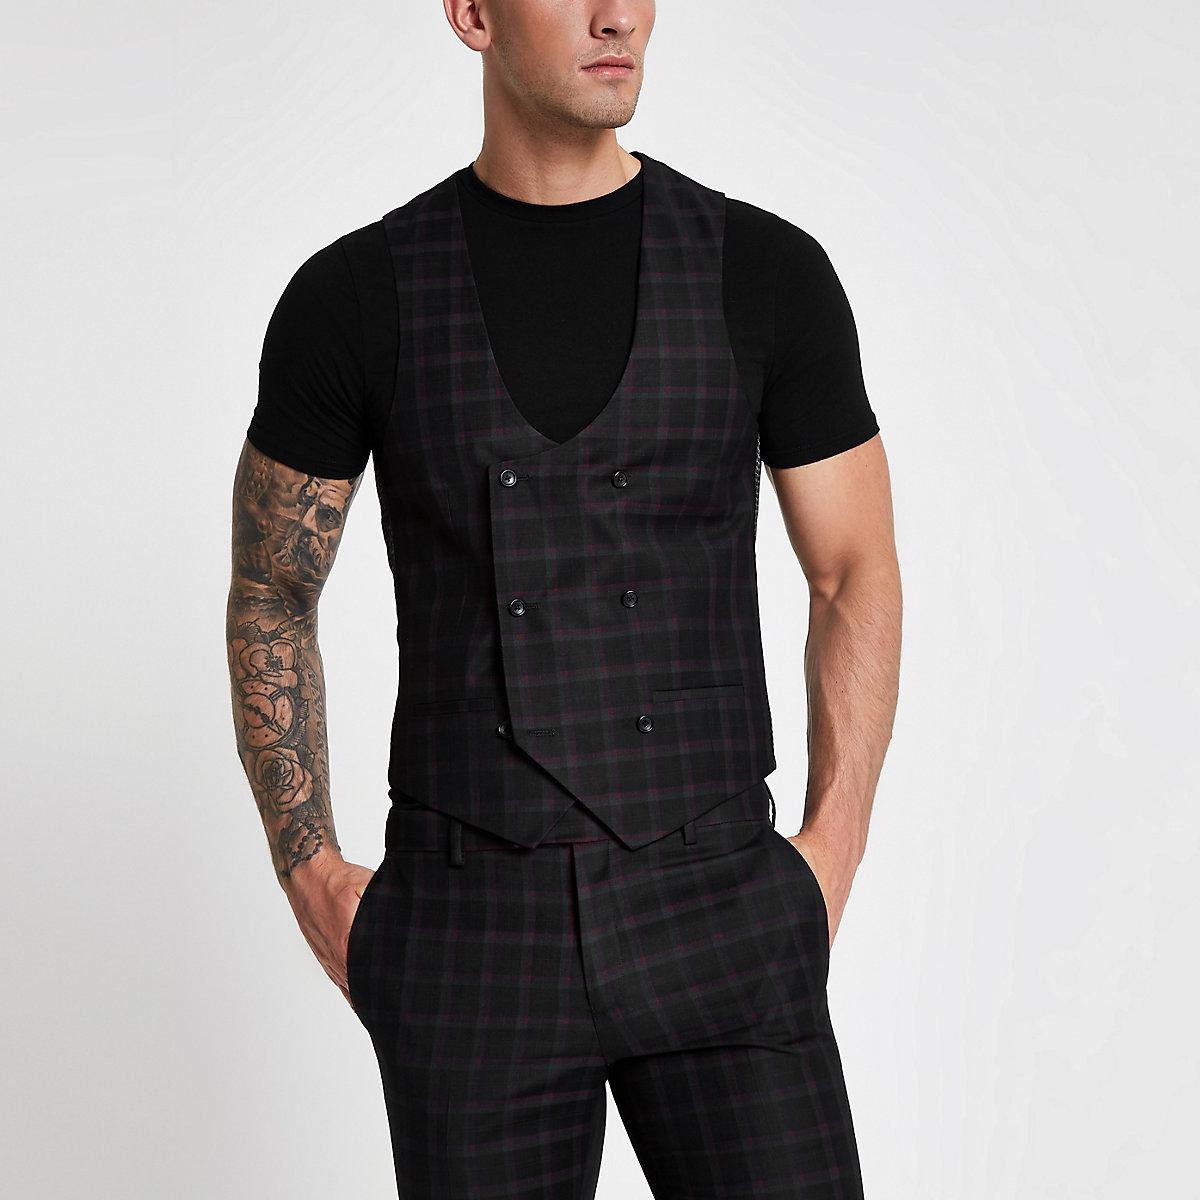 Black and burgundy check suit vest